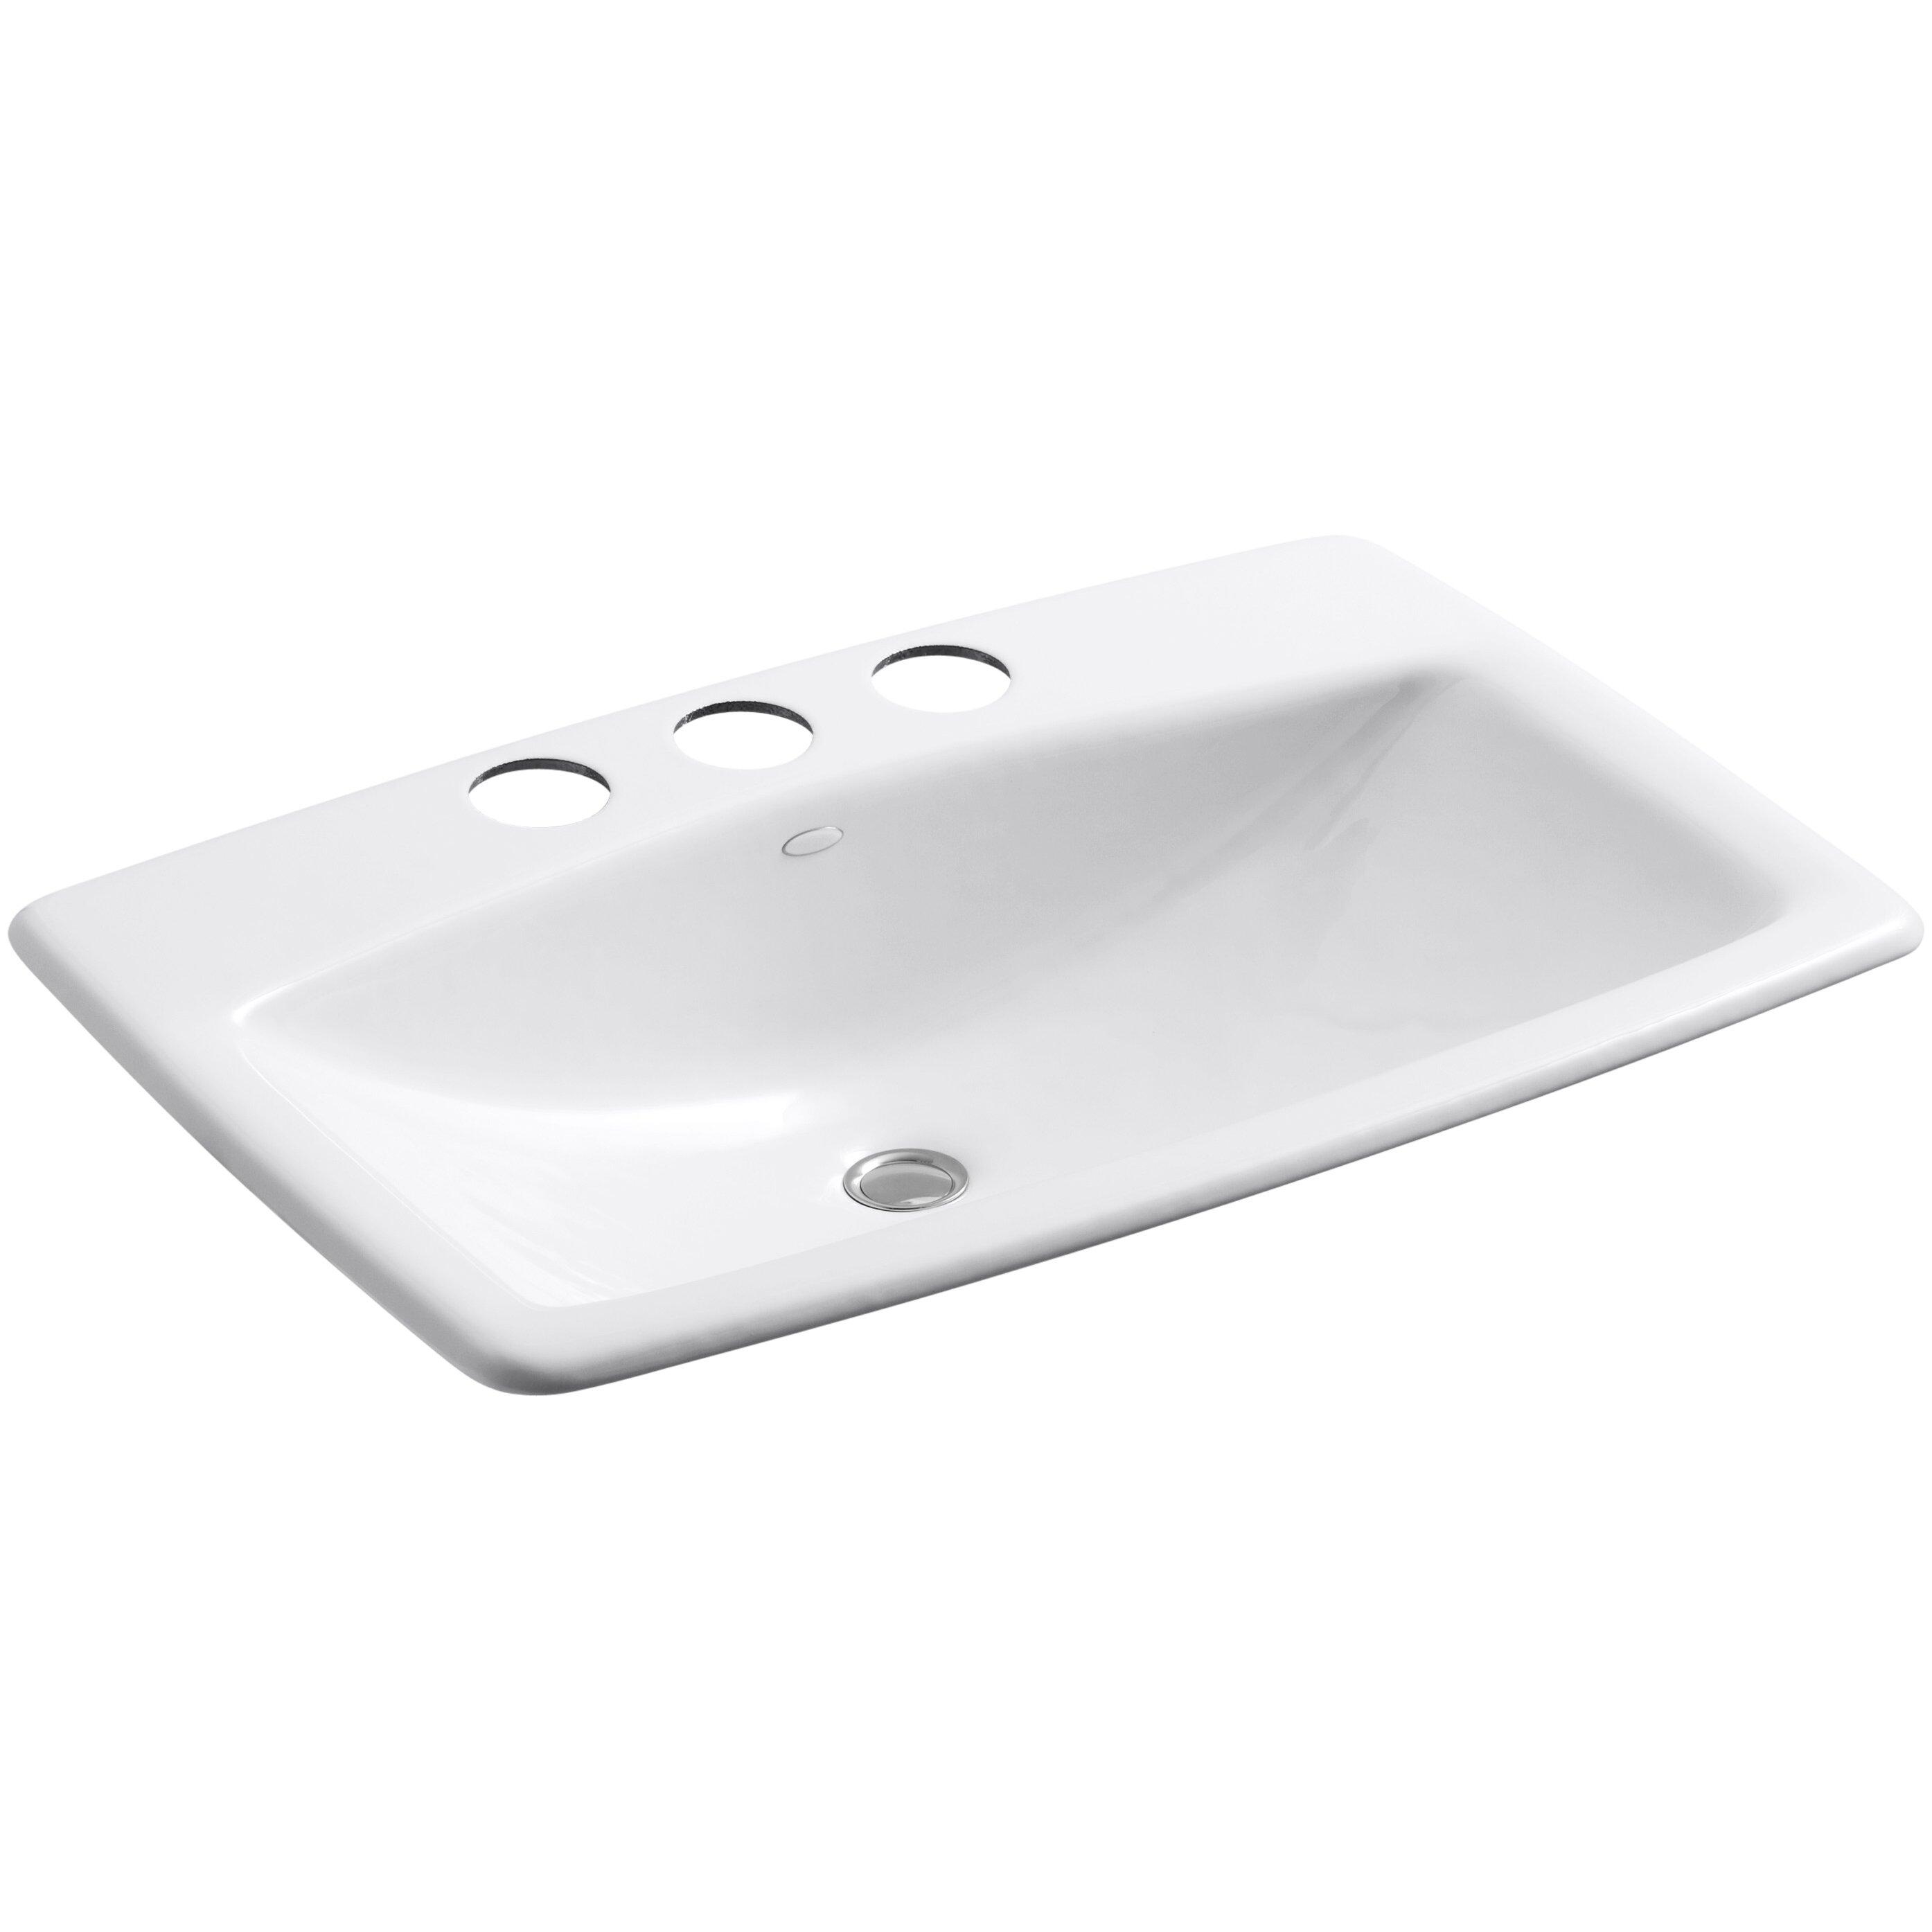 Kohler Man S Lav Undermount Bathroom Sink. Kohler Man S Lav Undermount Bathroom Sink   Reviews   Wayfair